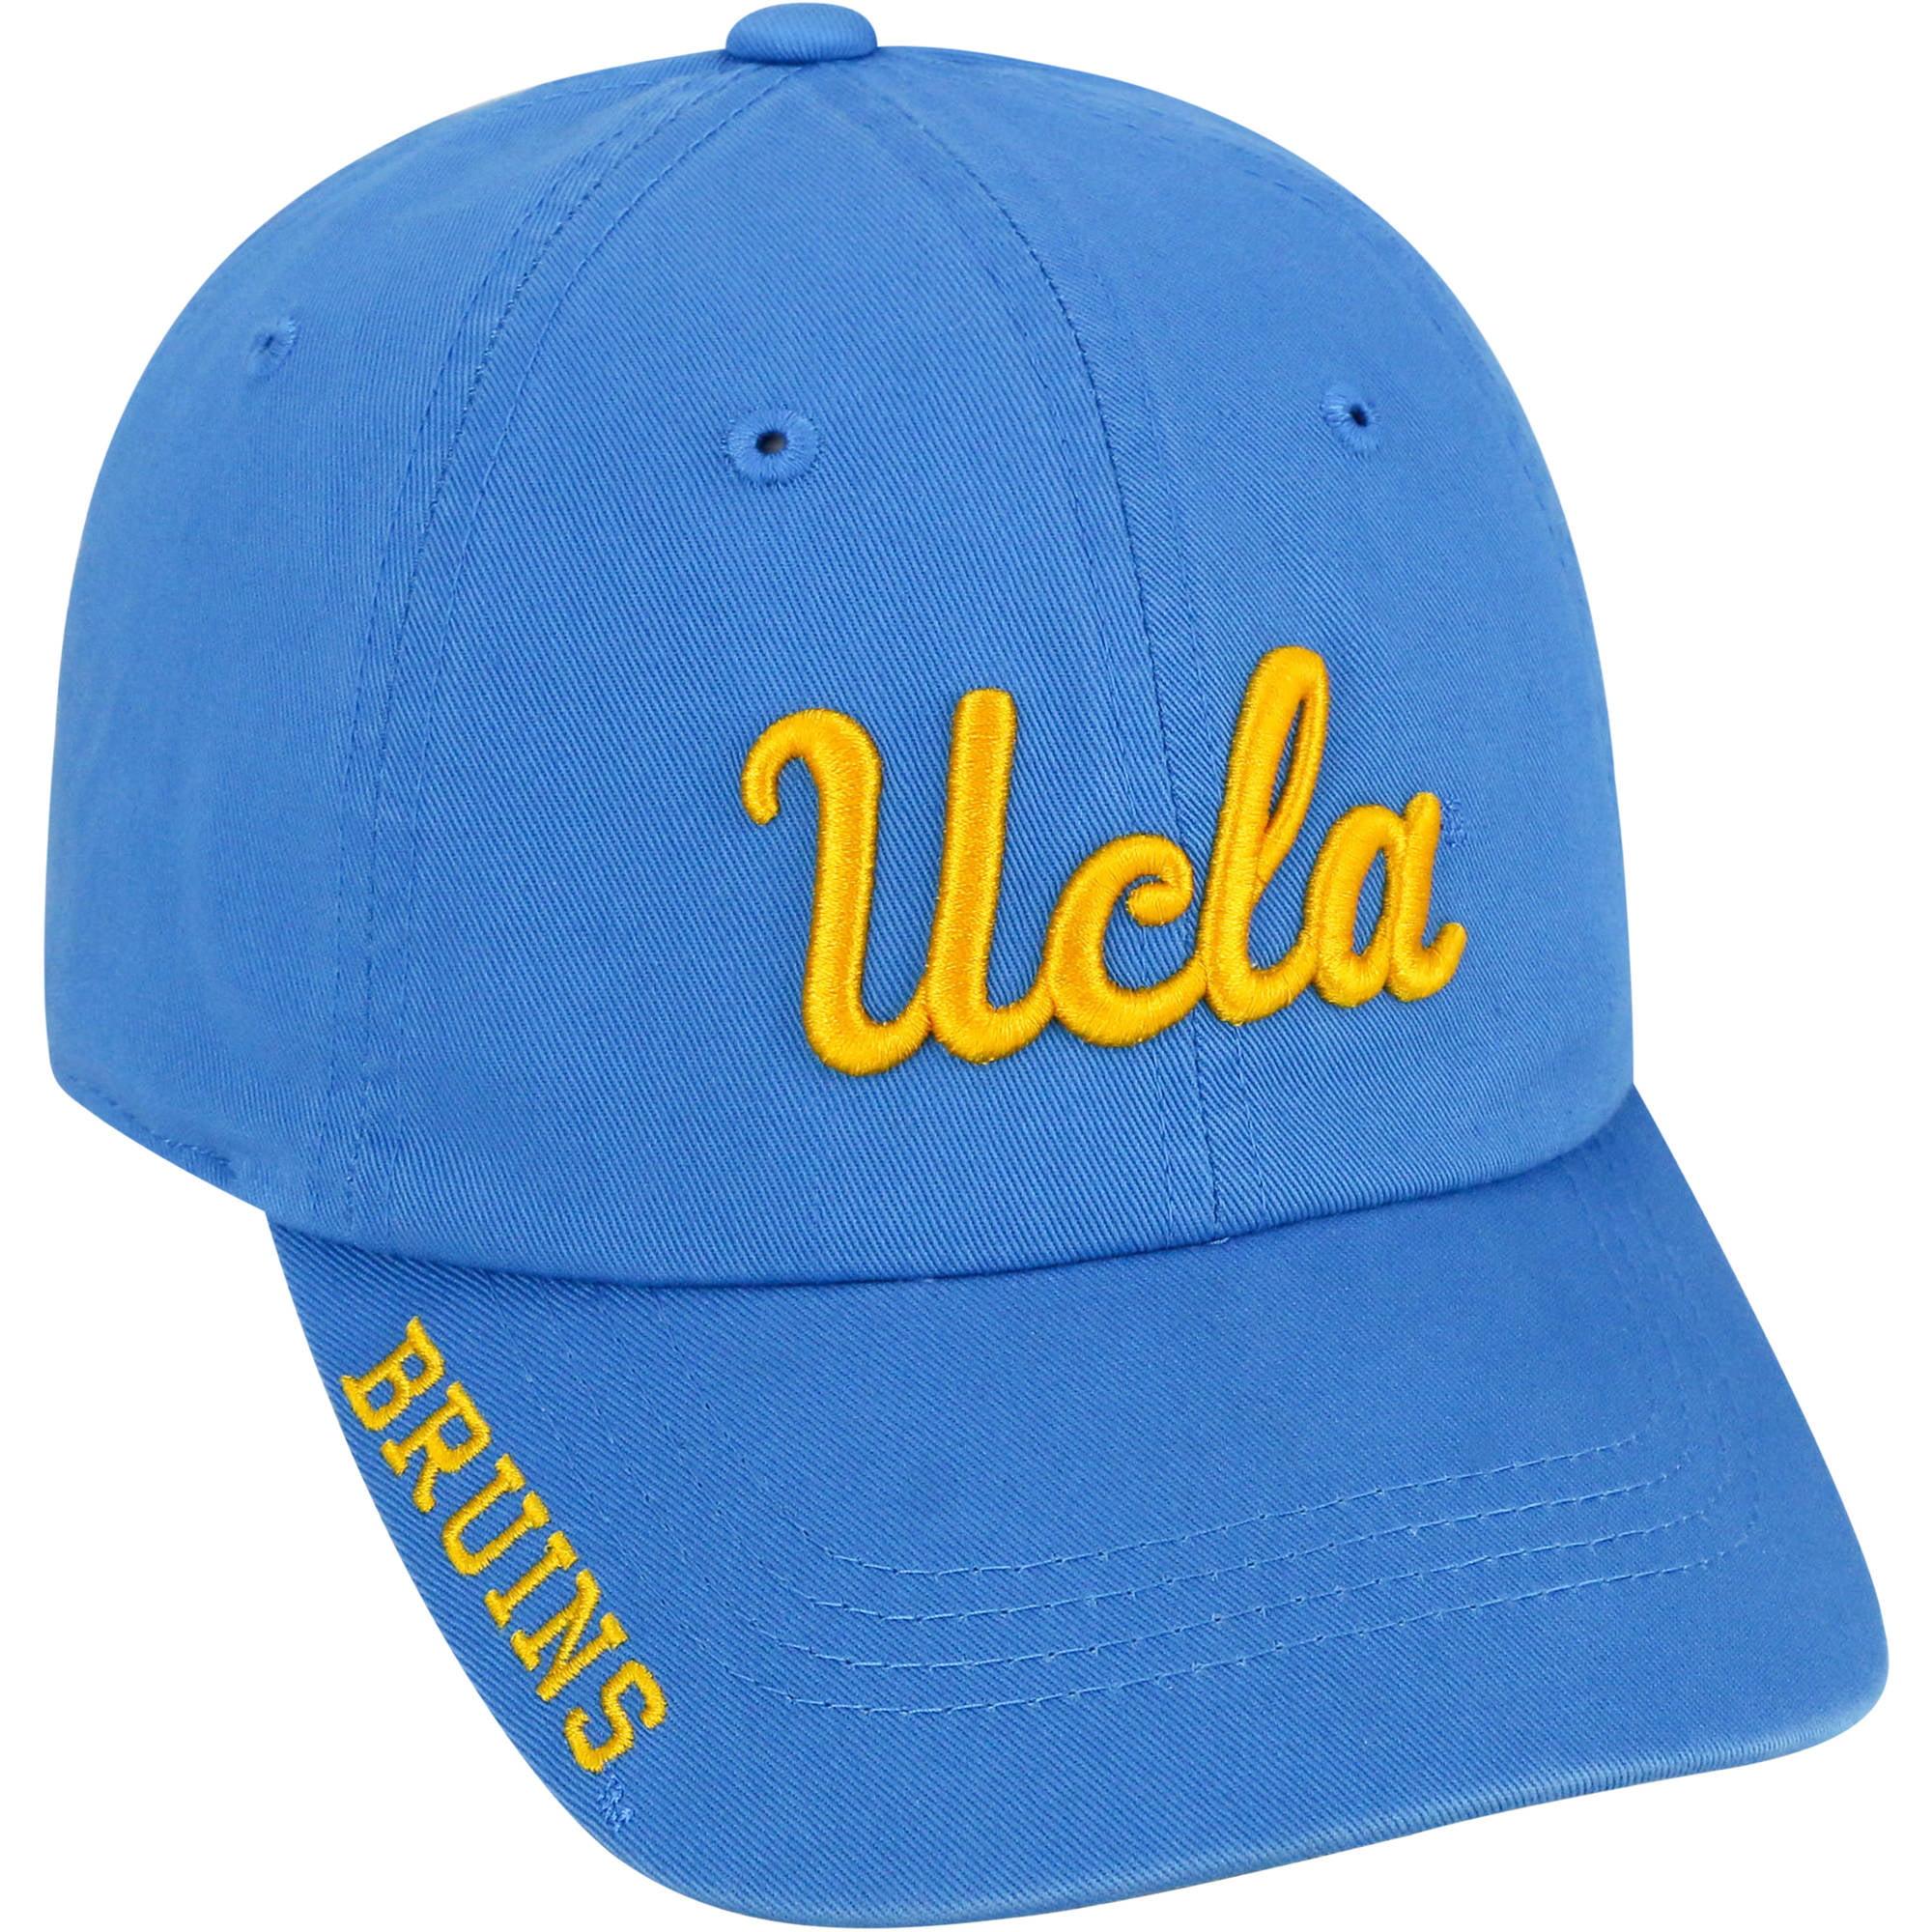 University Of Ucla Bruins Home Baseball Cap by